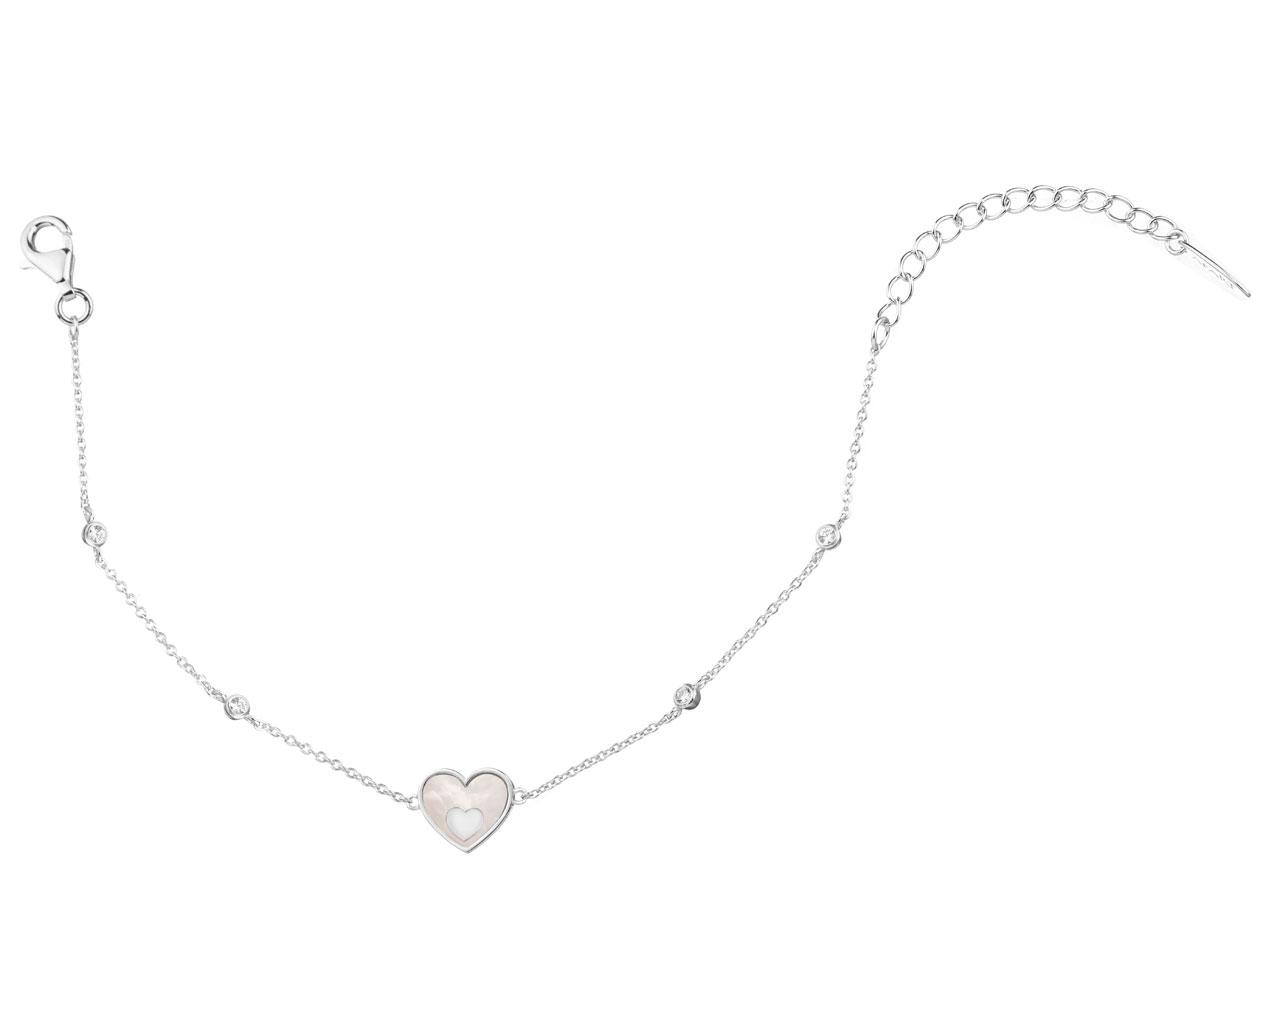 c375f1467f5c Silver Bracelet - The Best Produck Of Bracelet Man And Woman